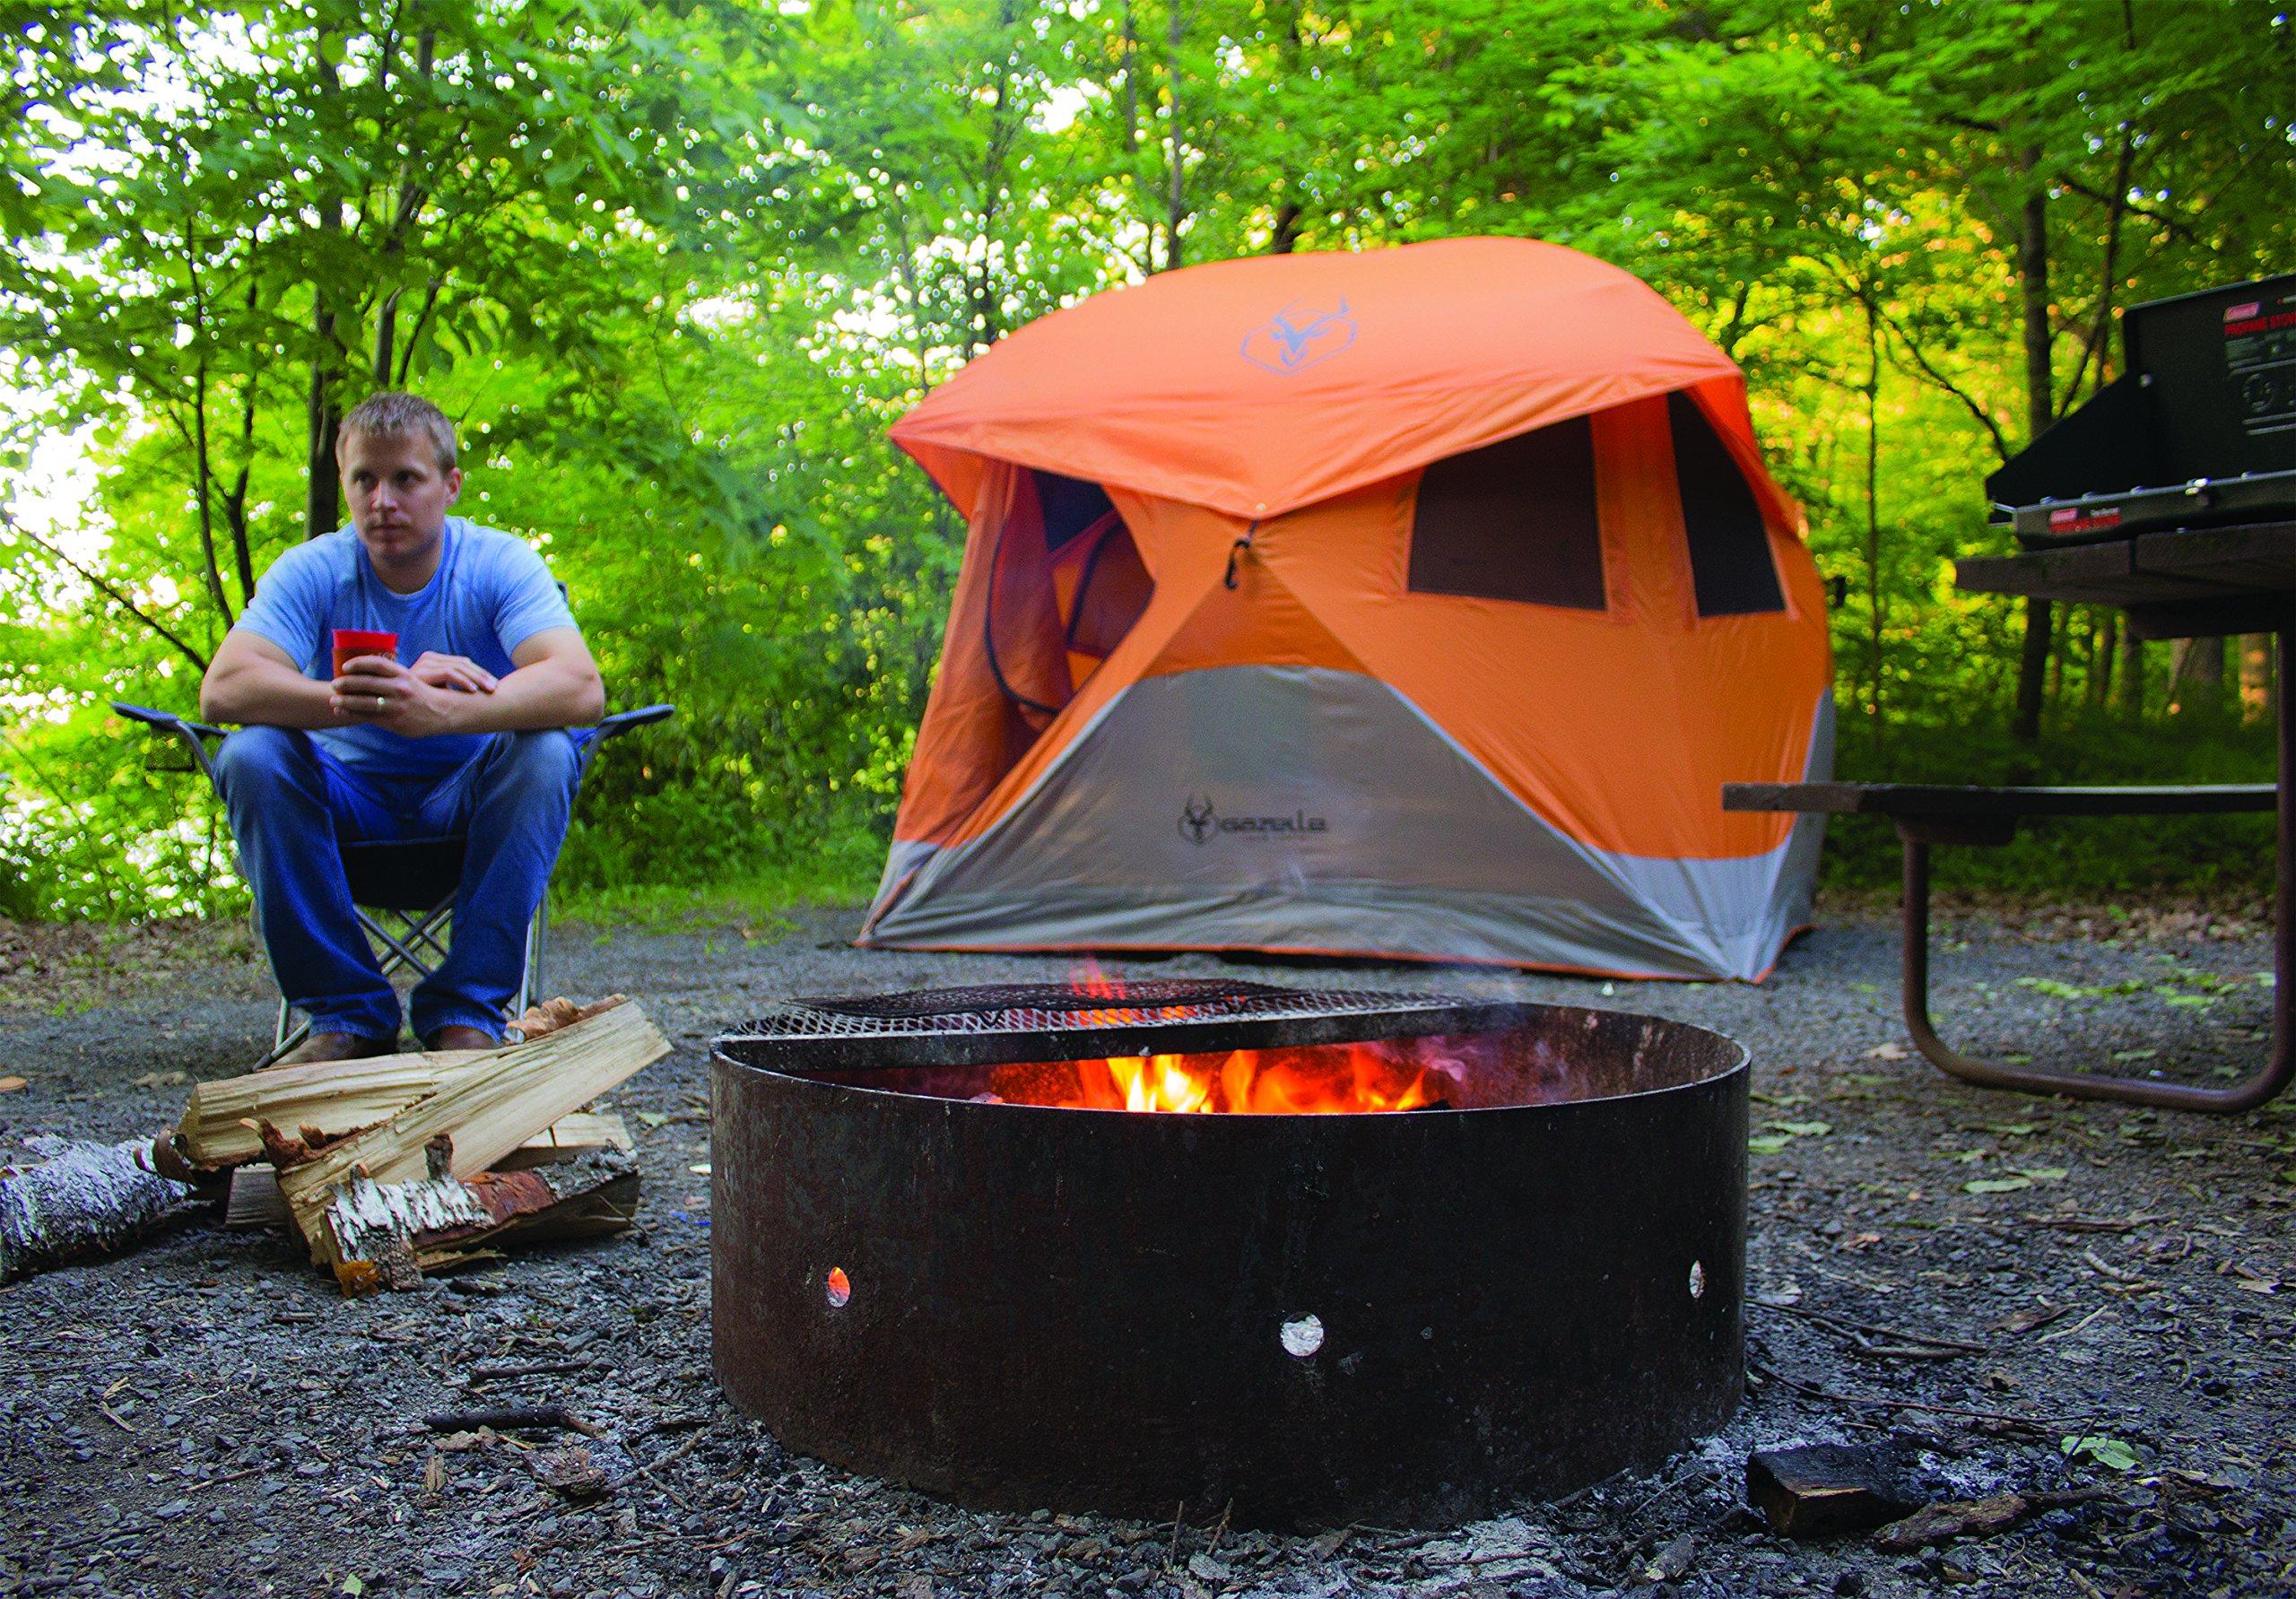 Gazelle 22272 T4 Pop Up Portable Camping Hub Tent Orange